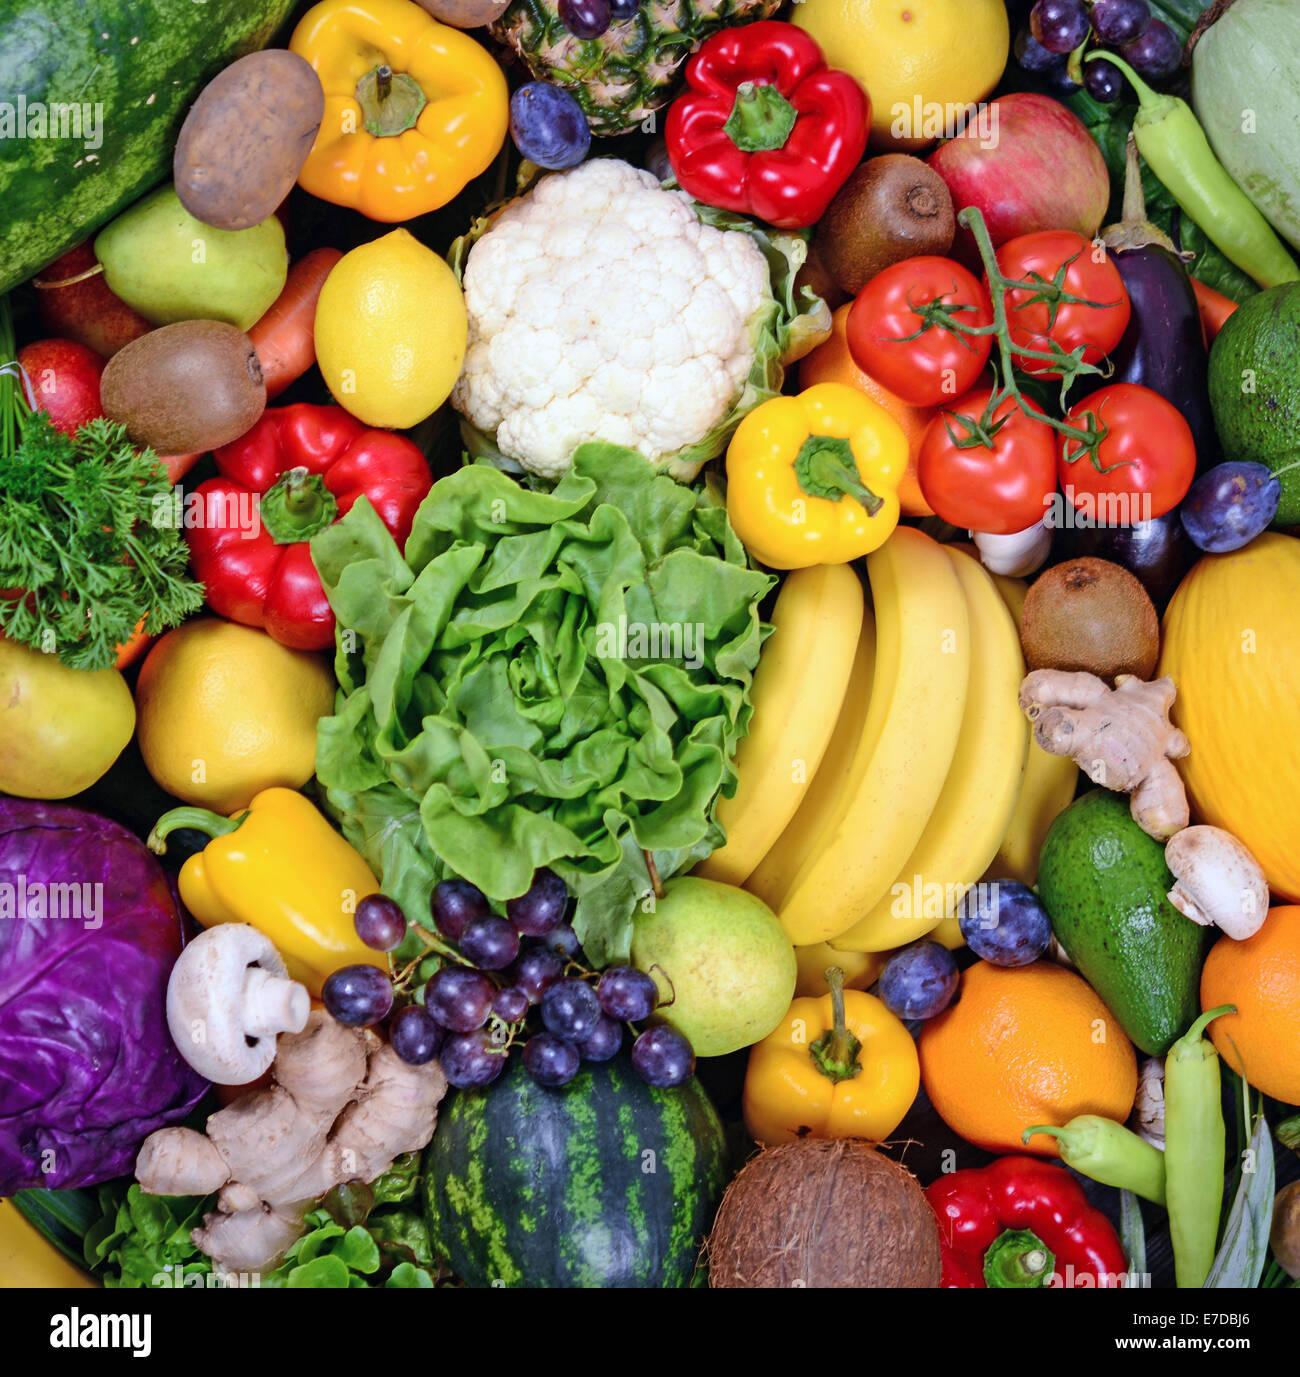 Huge group of fresh vegetables and fruit - High quality studio shot - Stock Image